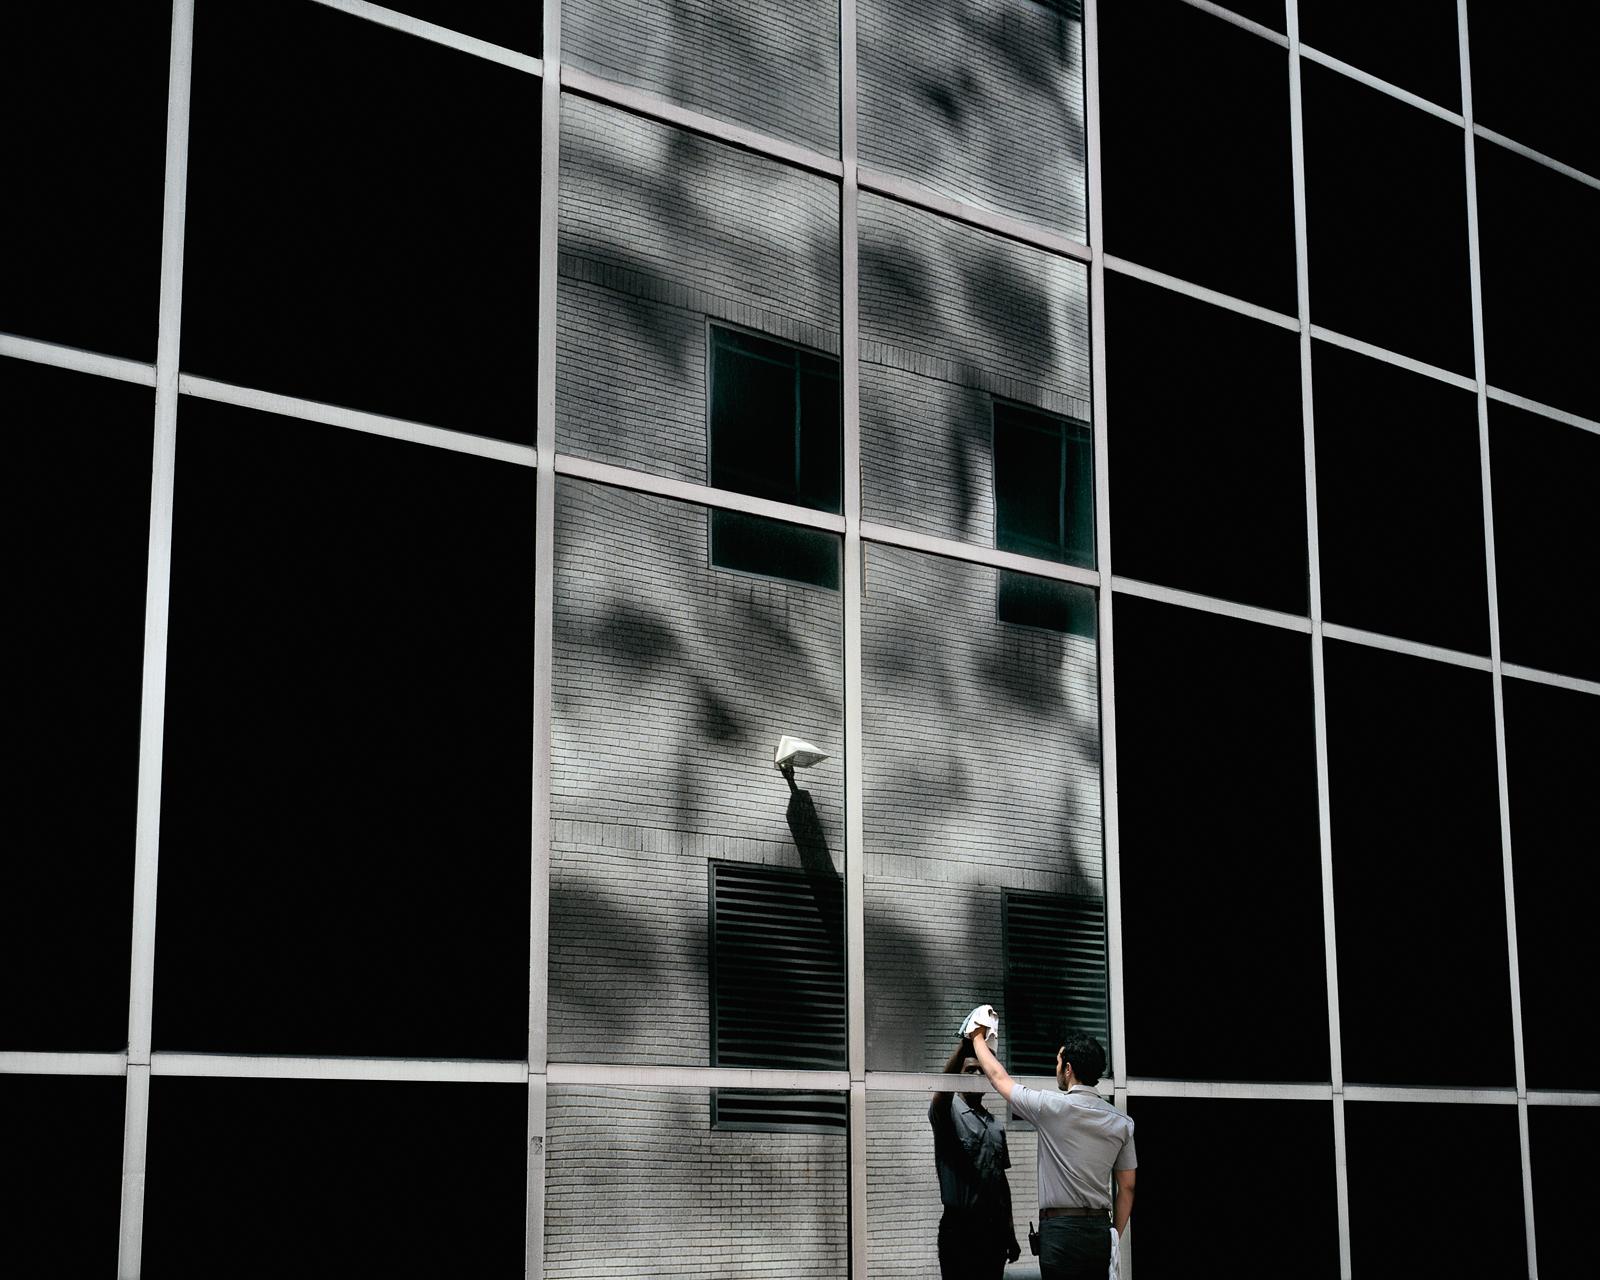 ©Clarissa Bonet / Images courtesy Catherine Edelman Gallery, Chicago.